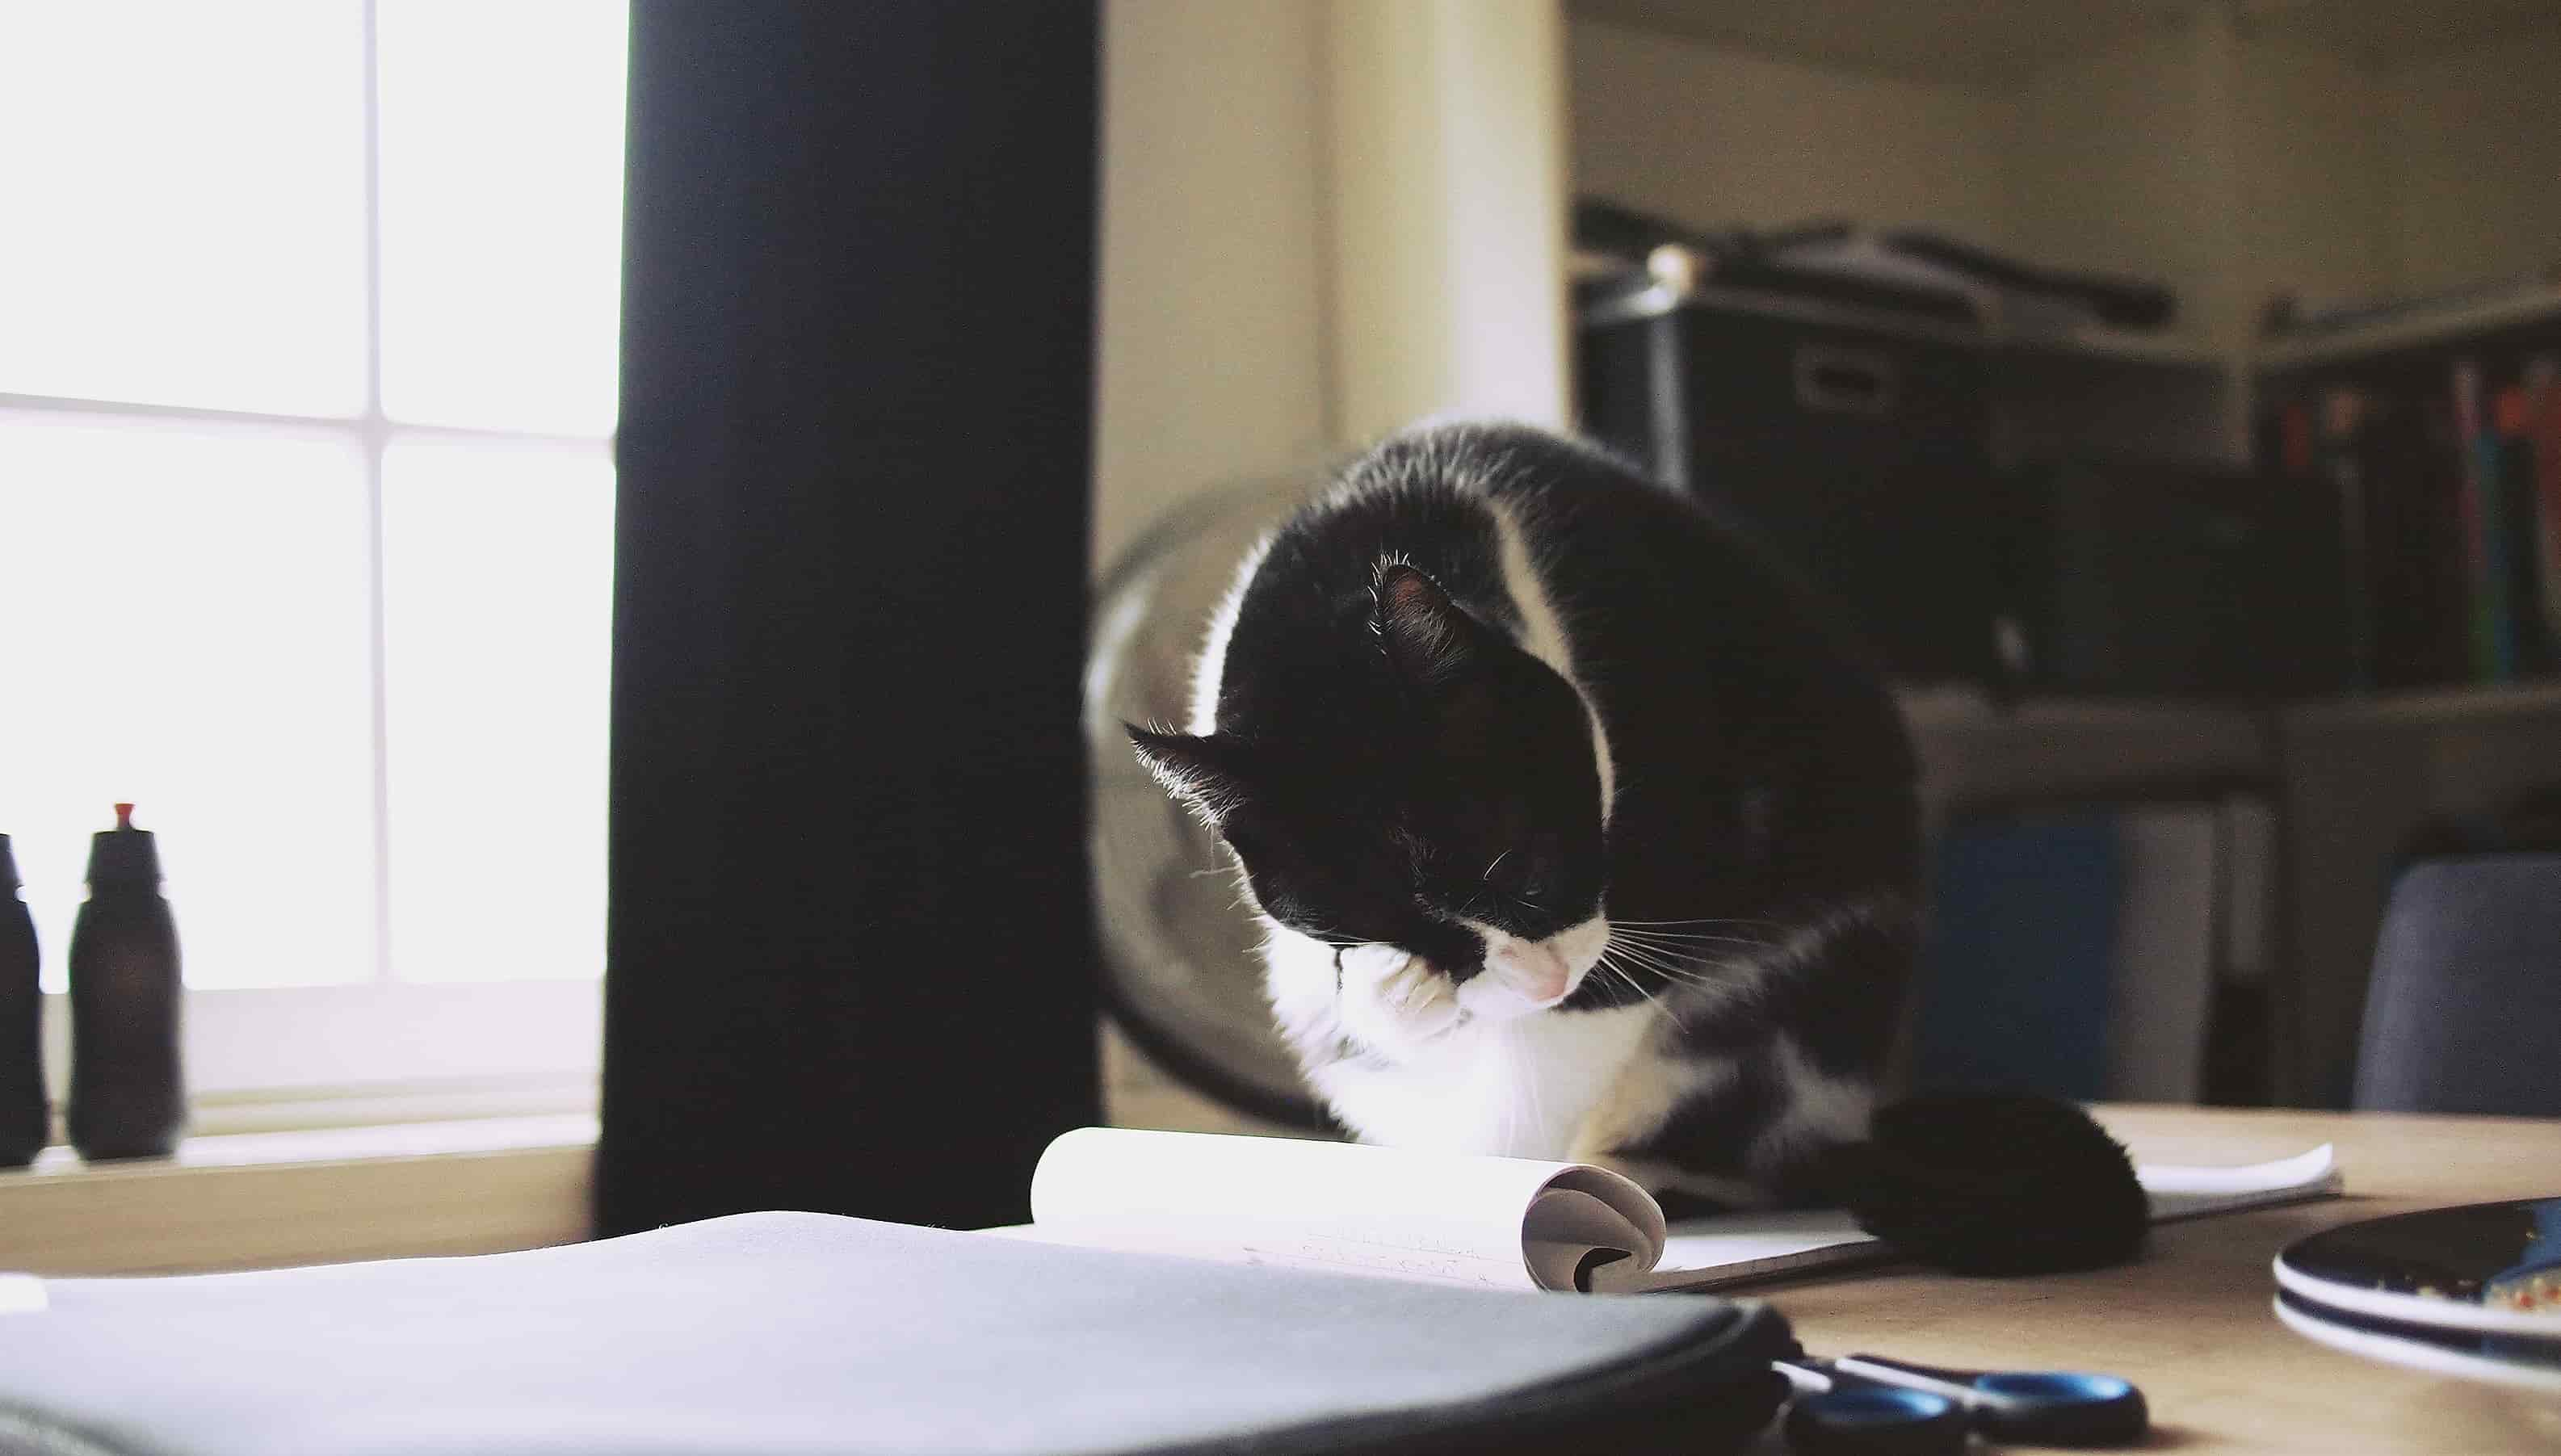 Cat, Credit Daria Nepriakhina